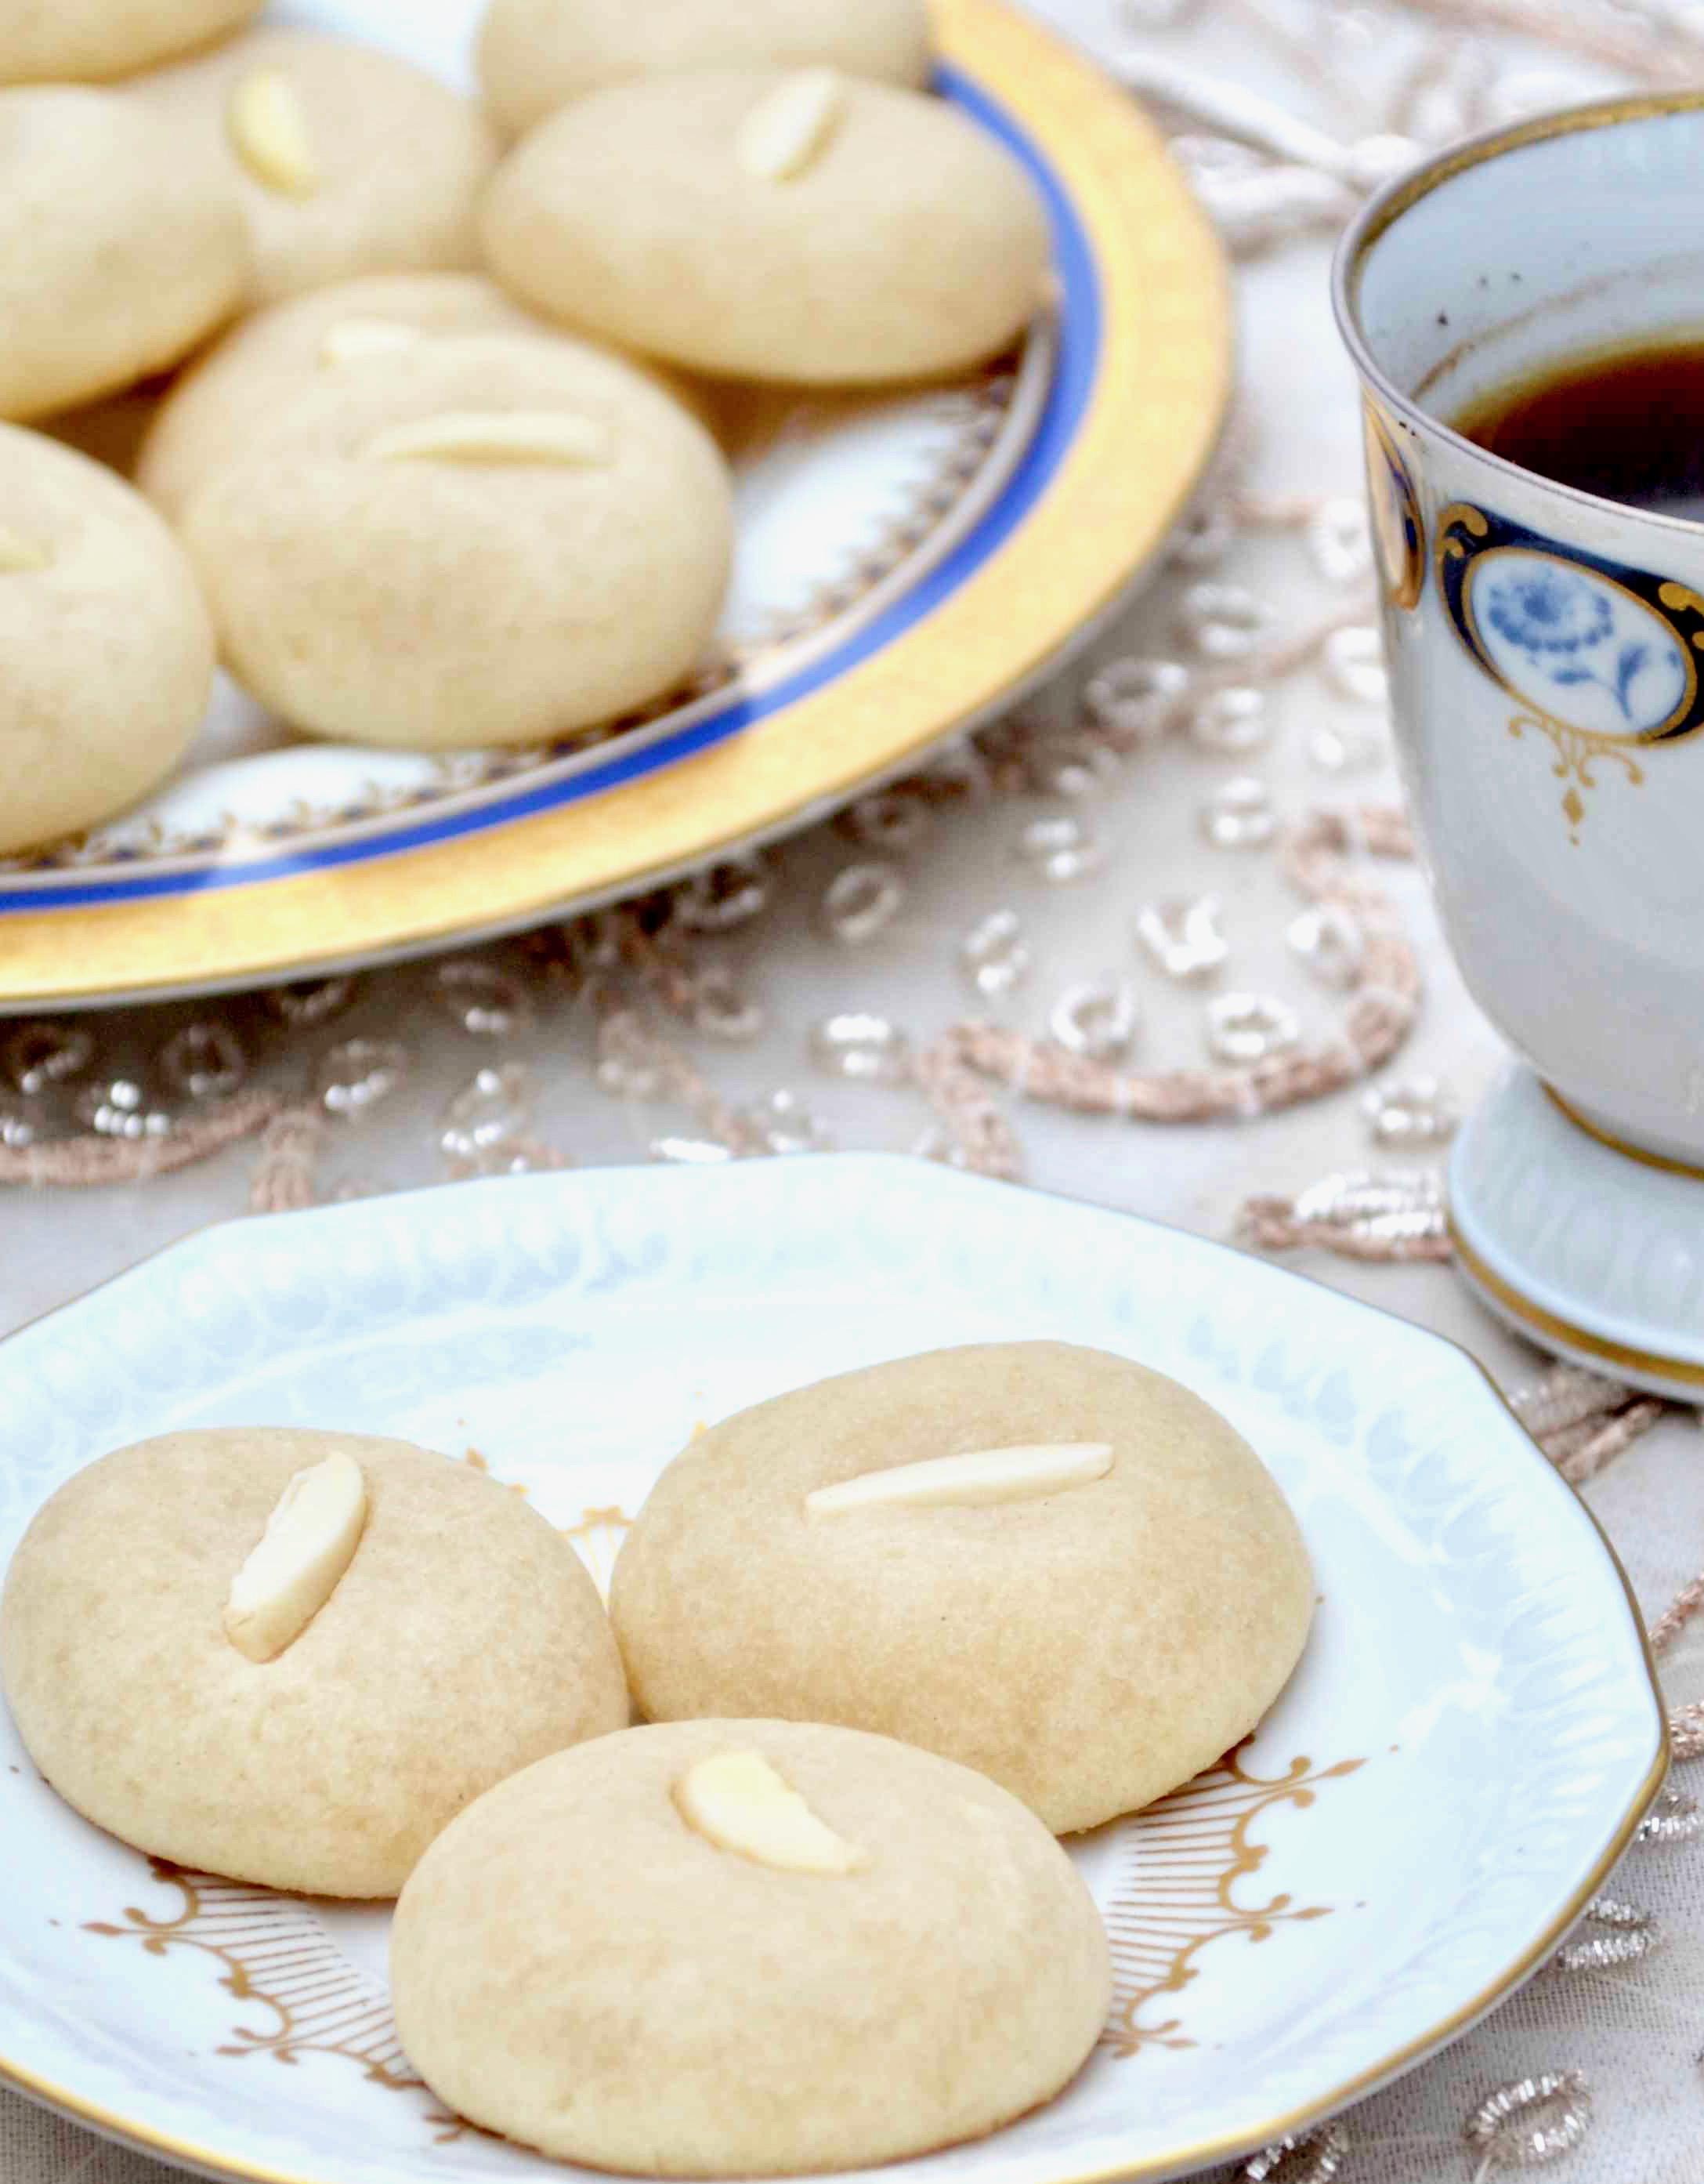 Arabic Food Made Easy - Measuring Cups, Optional